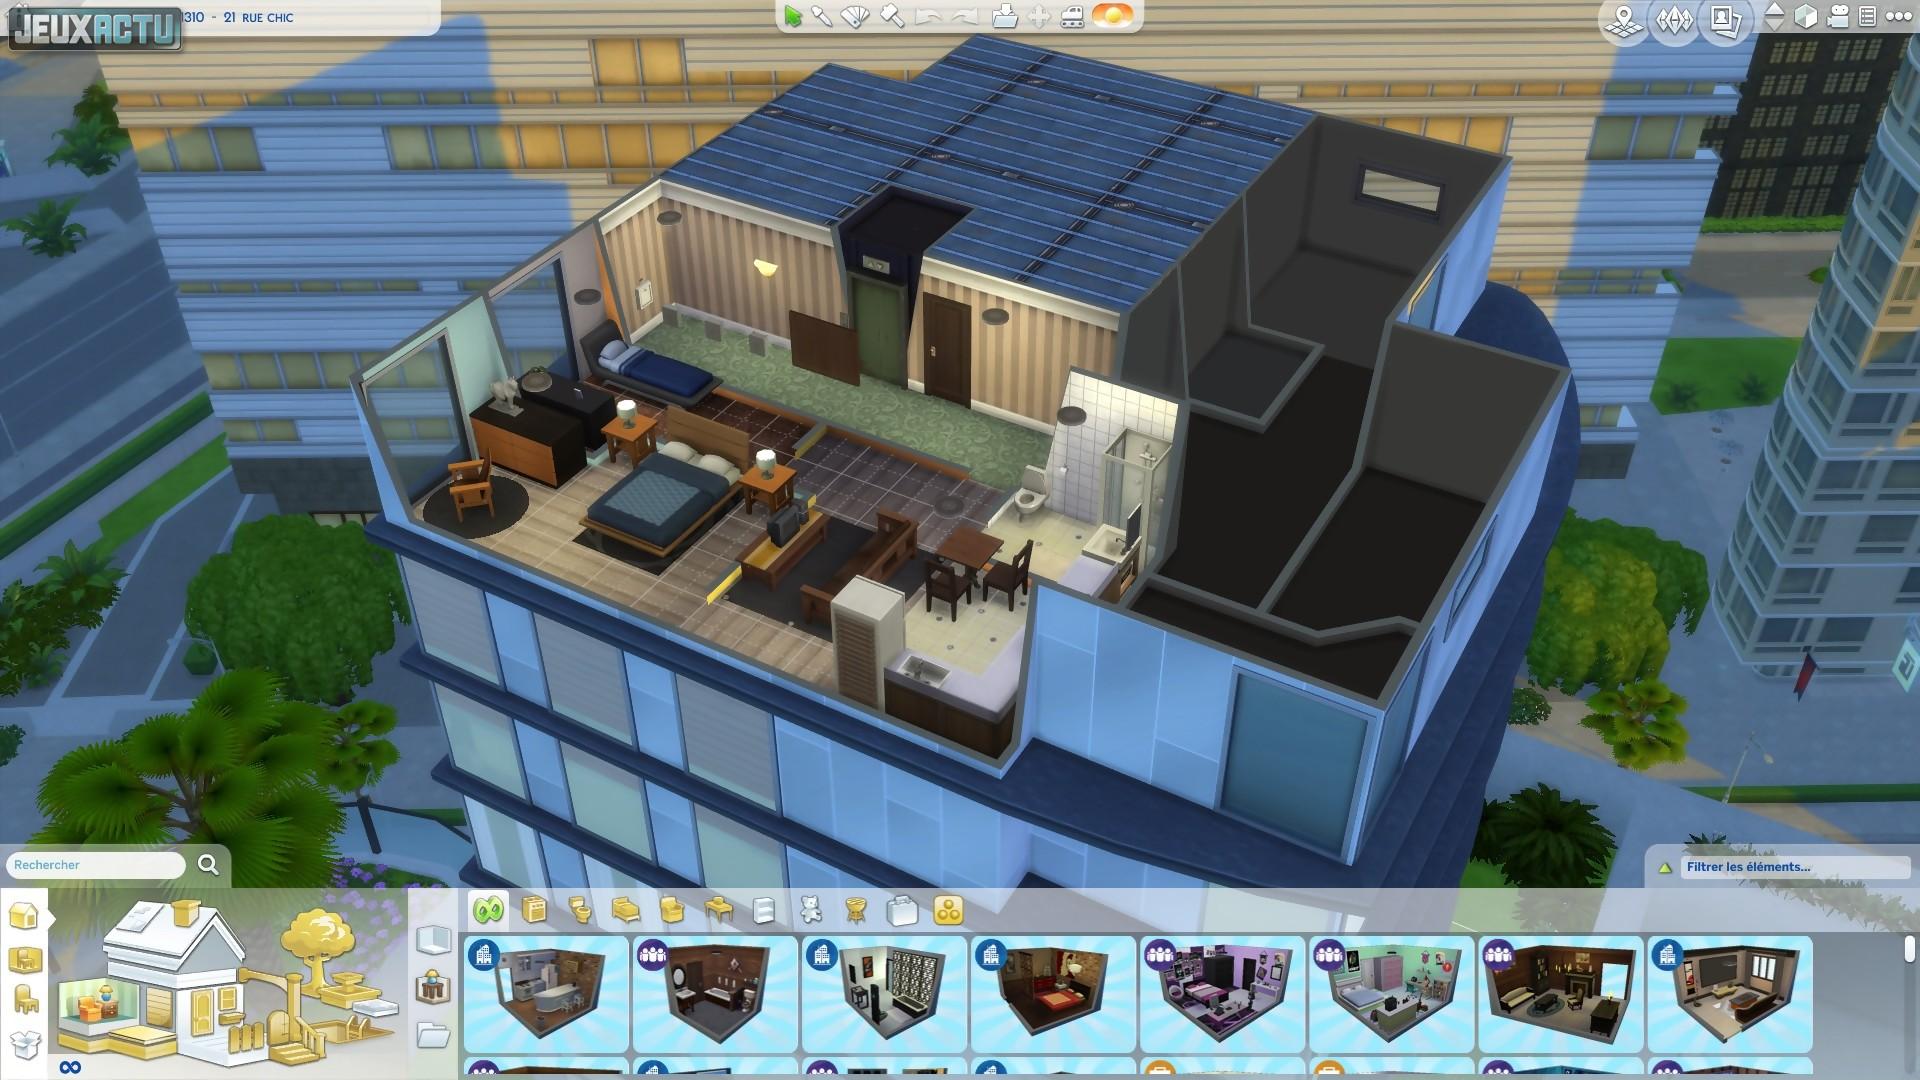 Images Les Sims 4 : Vie Citadine